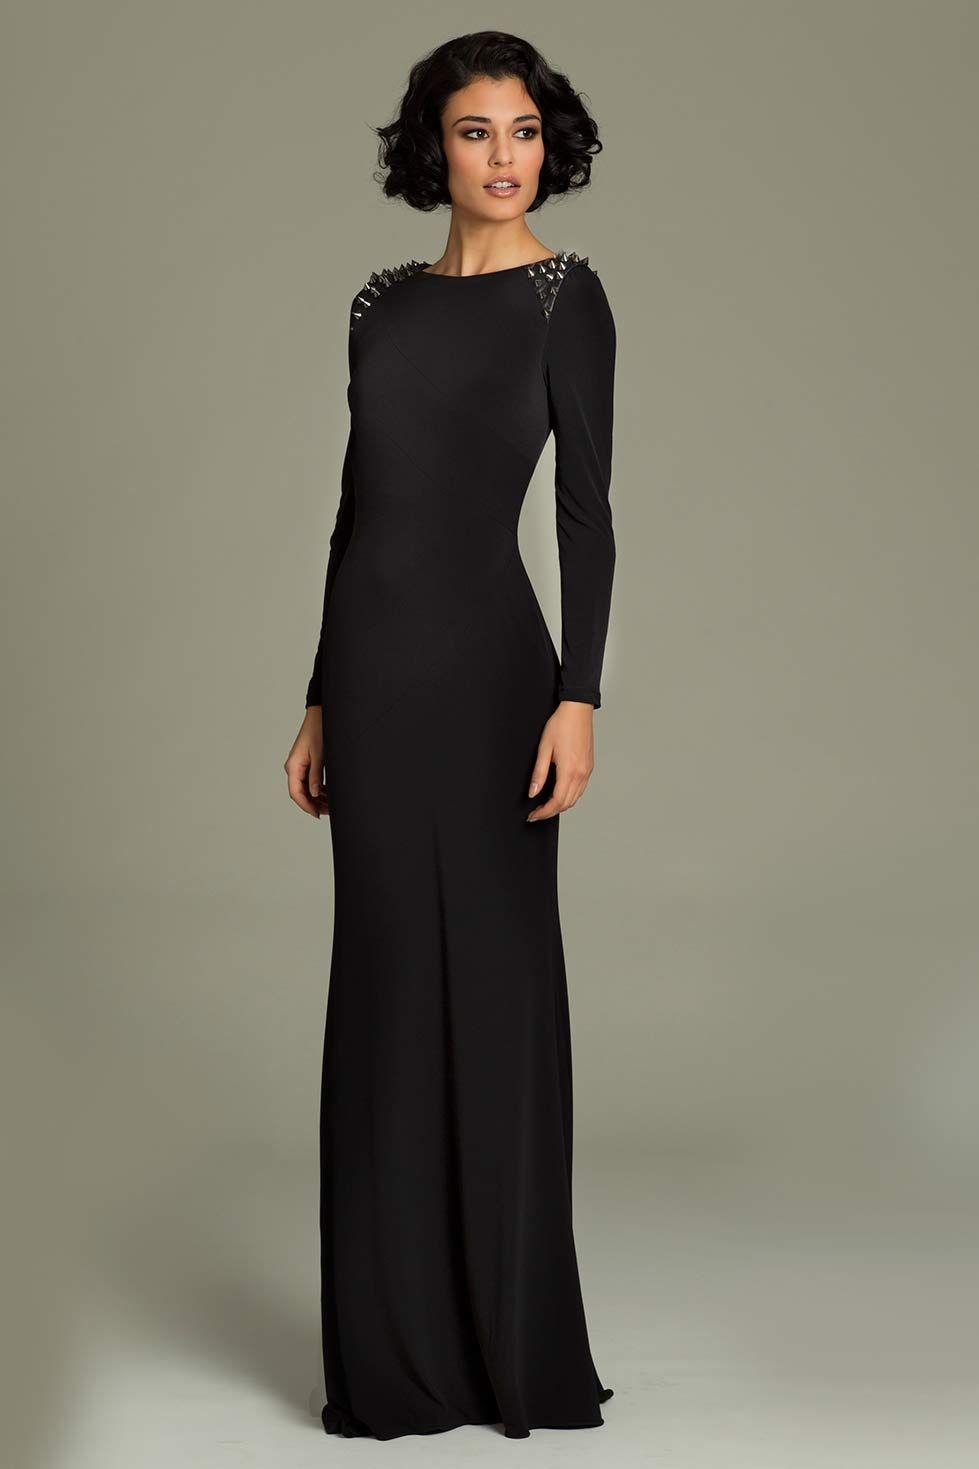 Long sleeve jersey Jovani dress